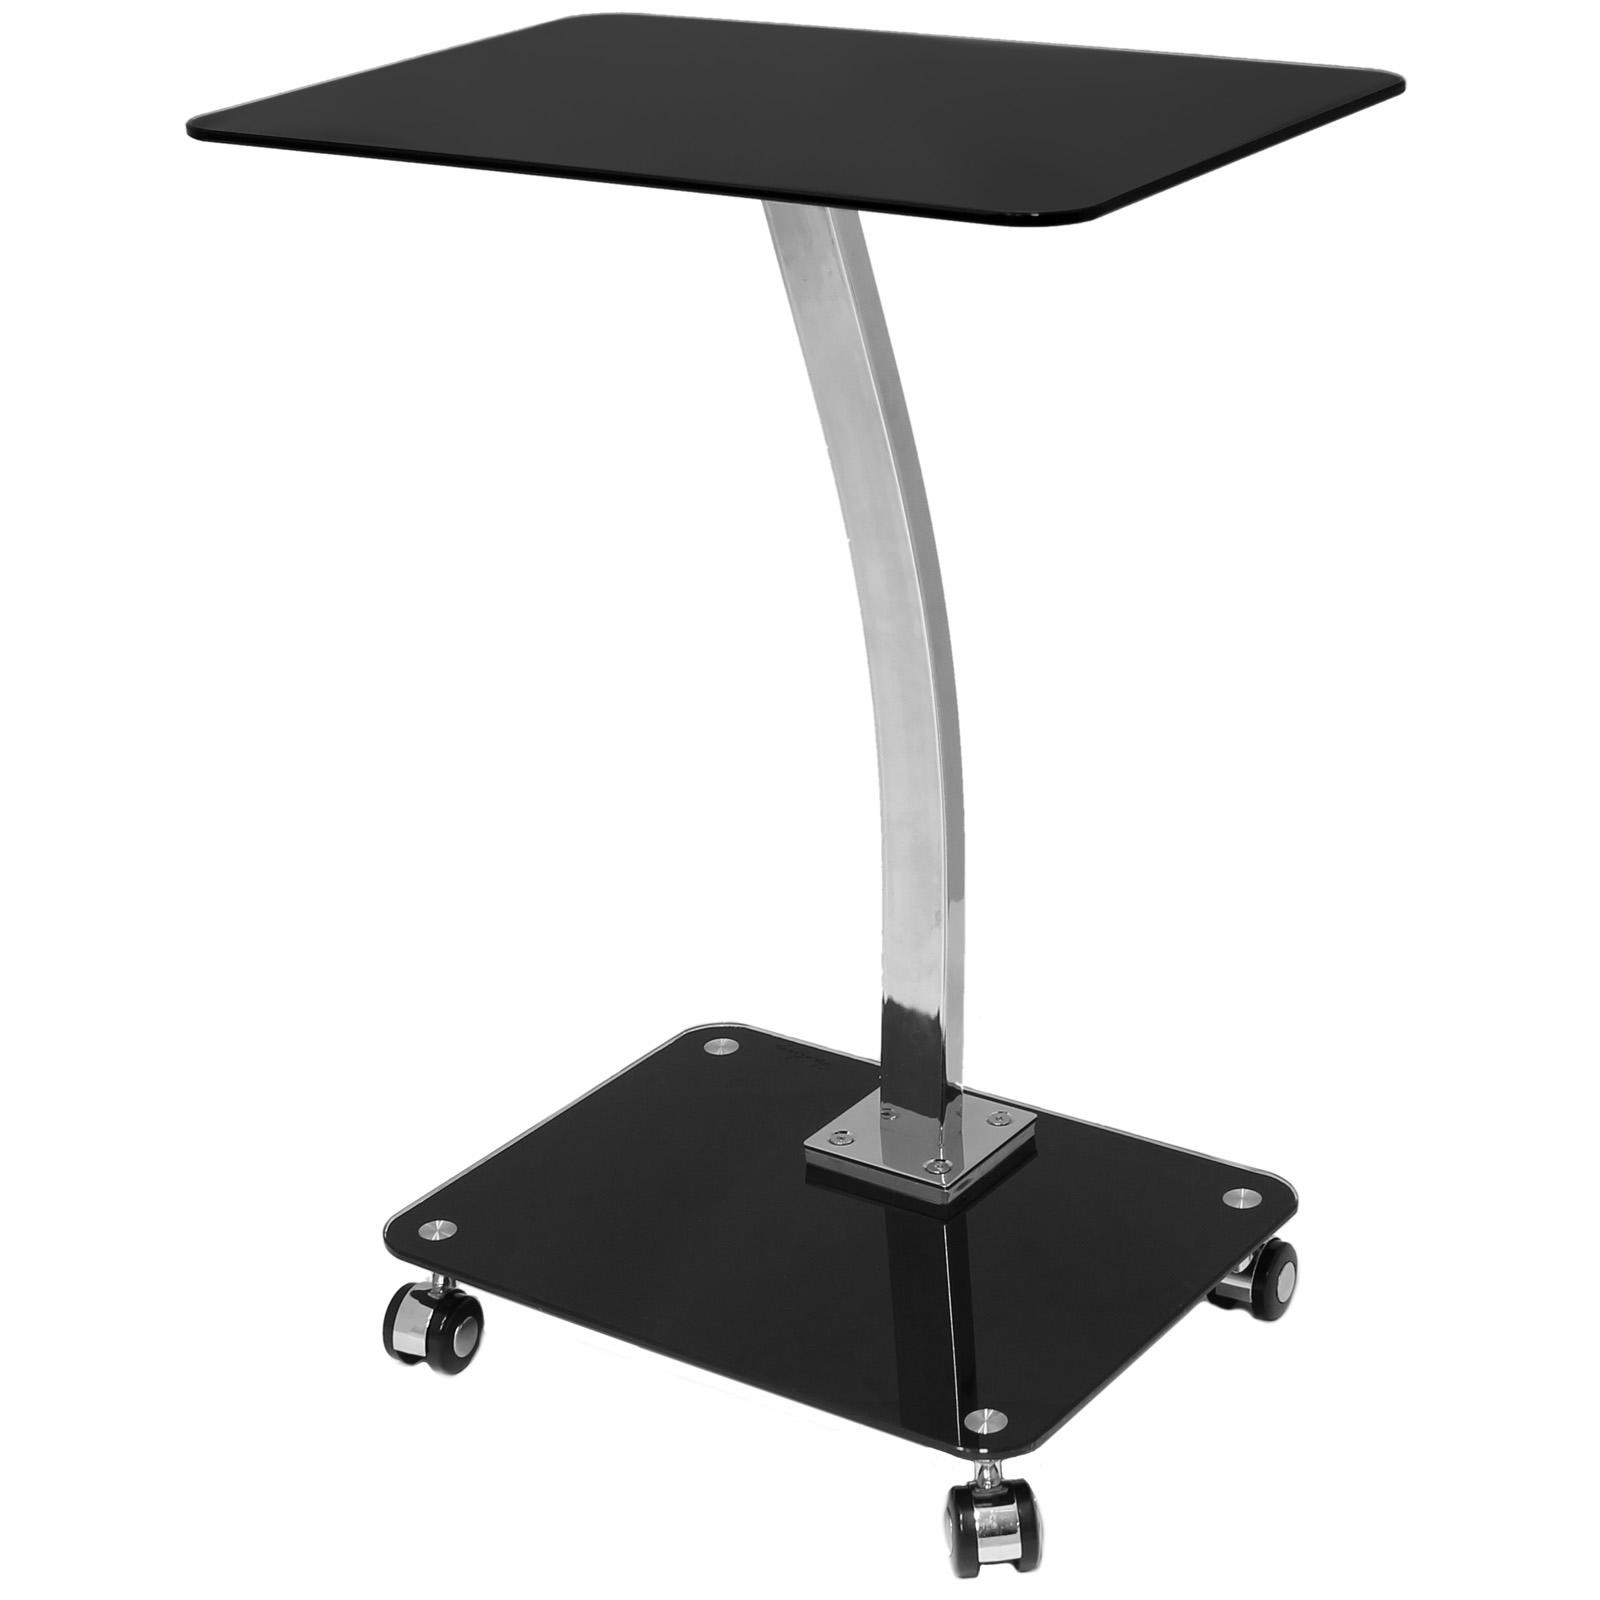 sofa portable table kedai repair shah alam glass laptop computer netbook stand desk tray